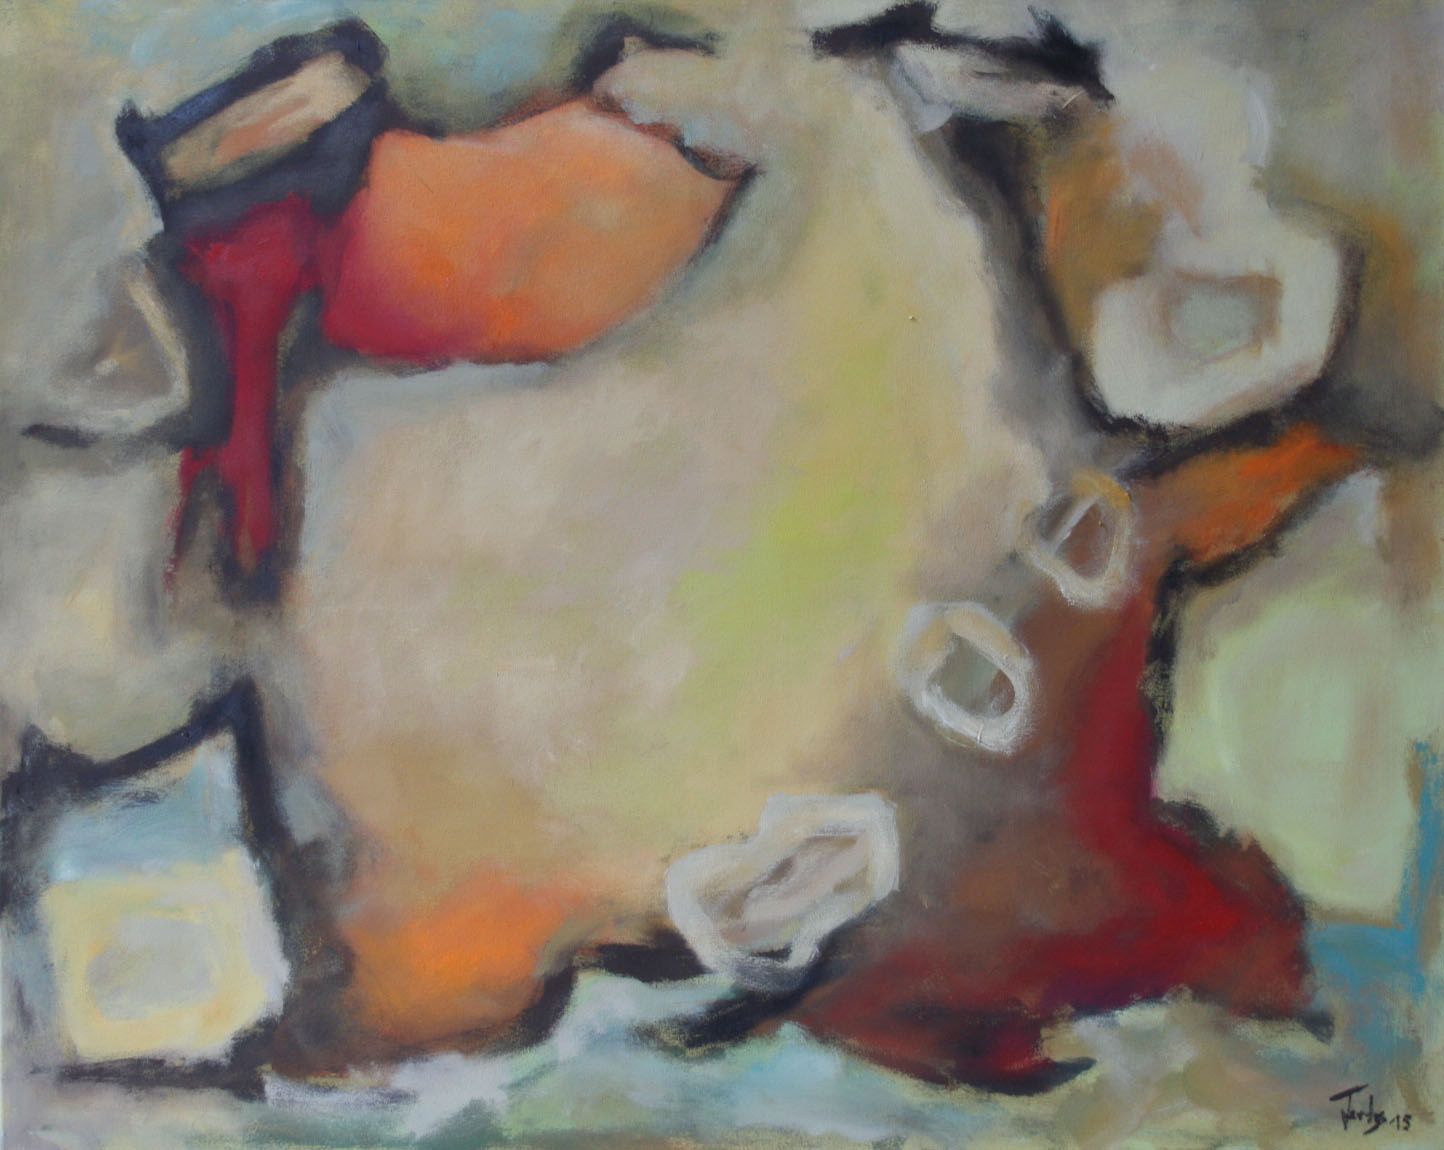 Losgelöst, Öl und Acryl auf Leinwand, 80 x 100 cm